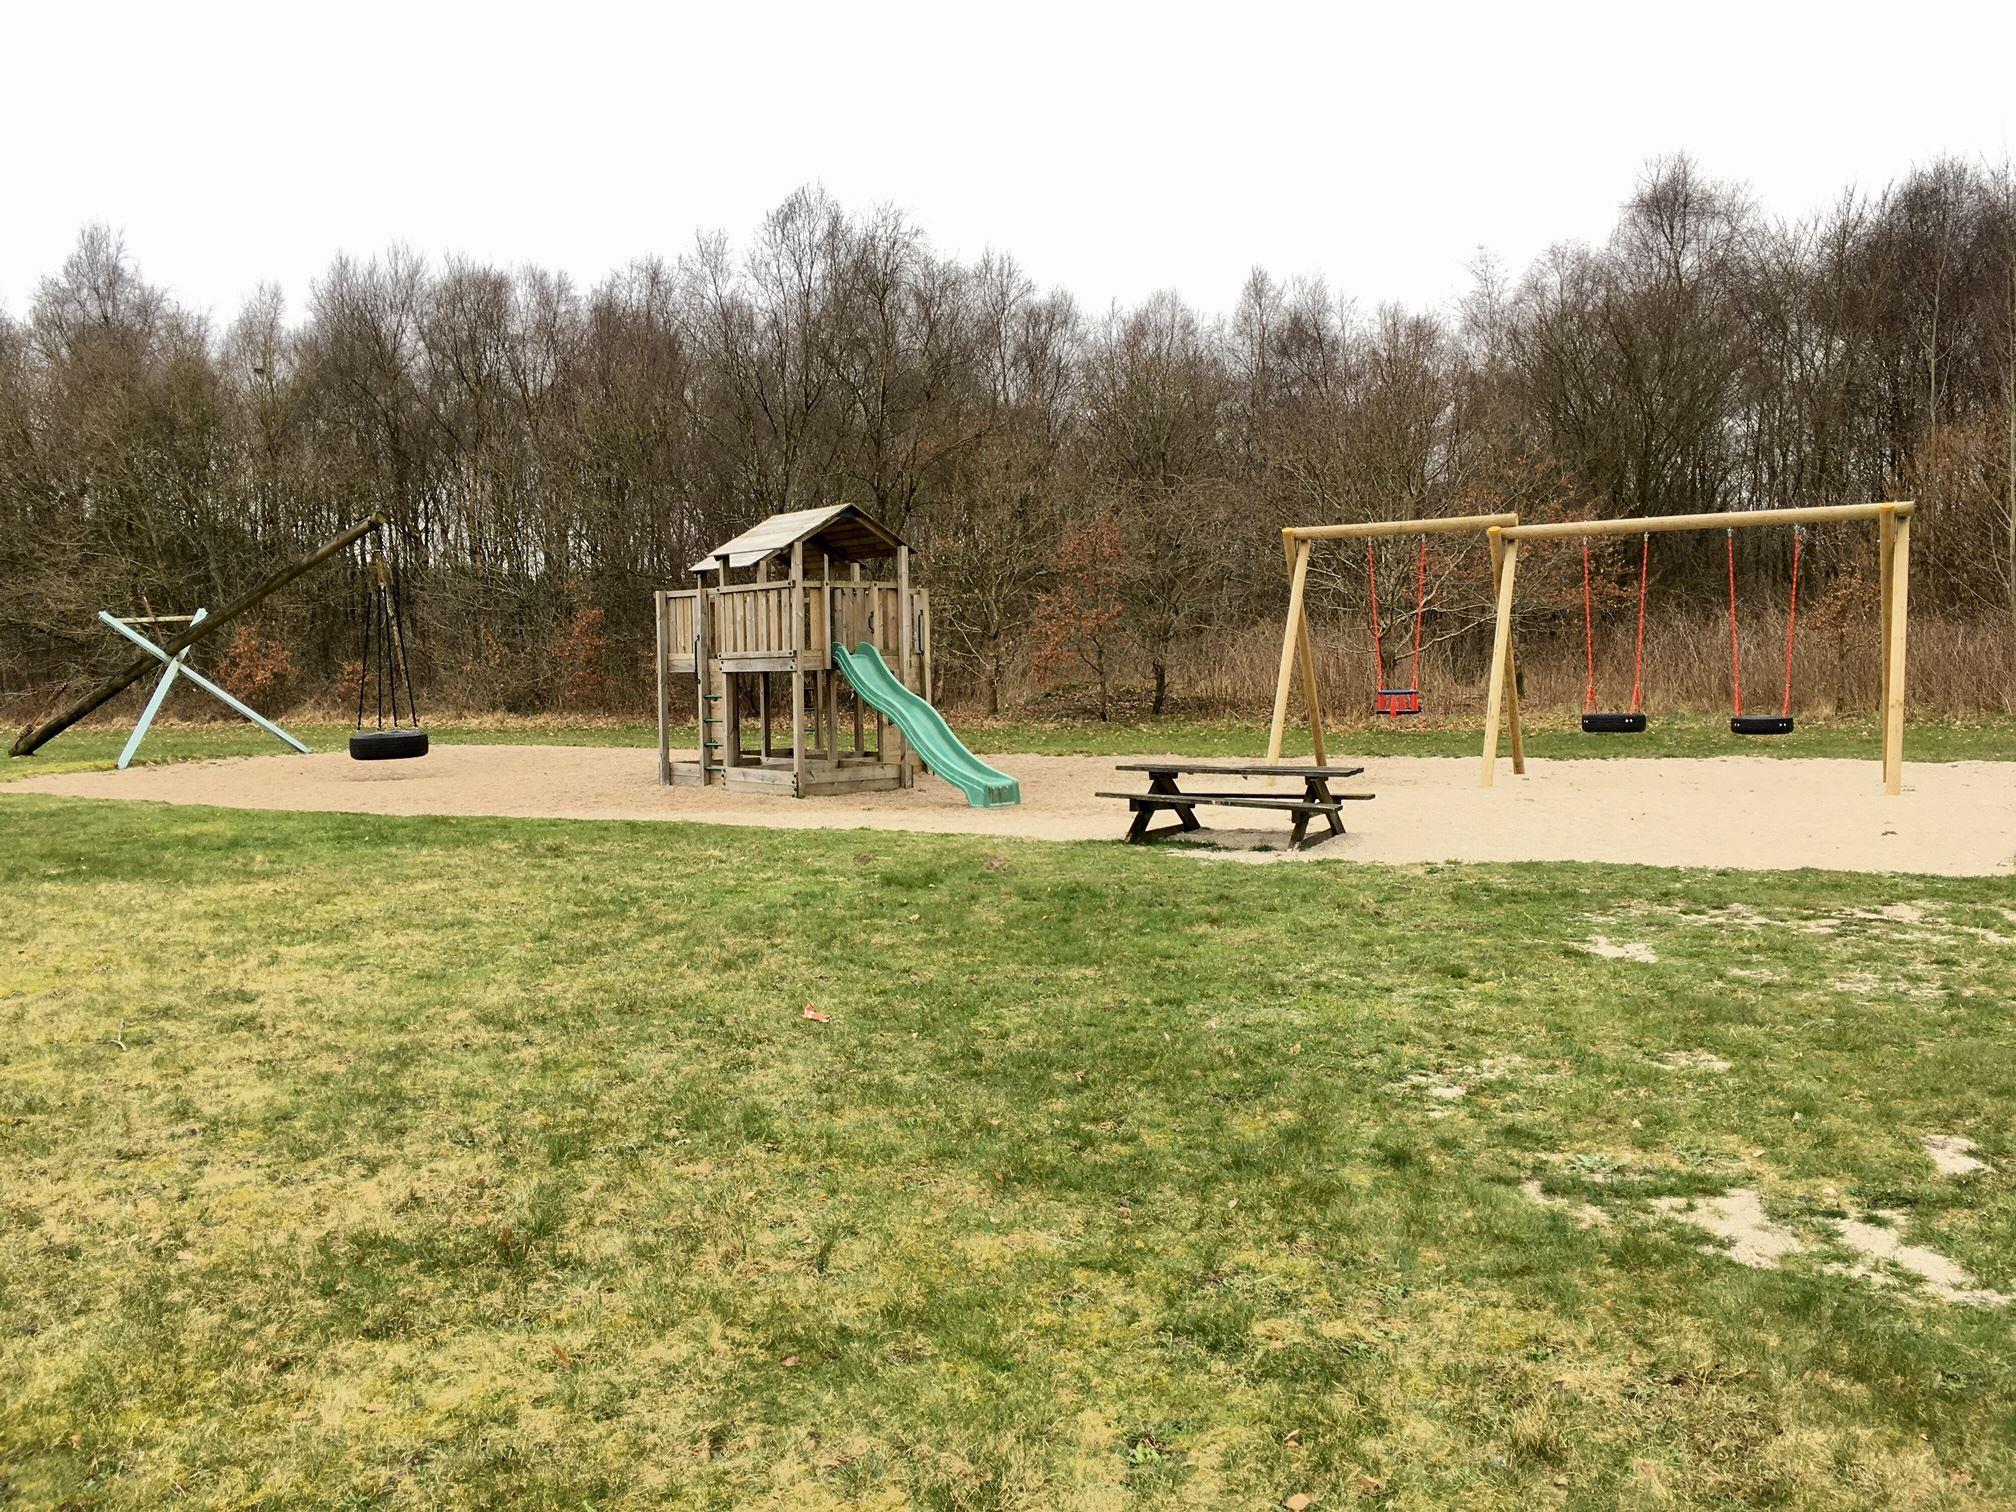 Camping in Tørsbøl - nur Woche 30, 2017